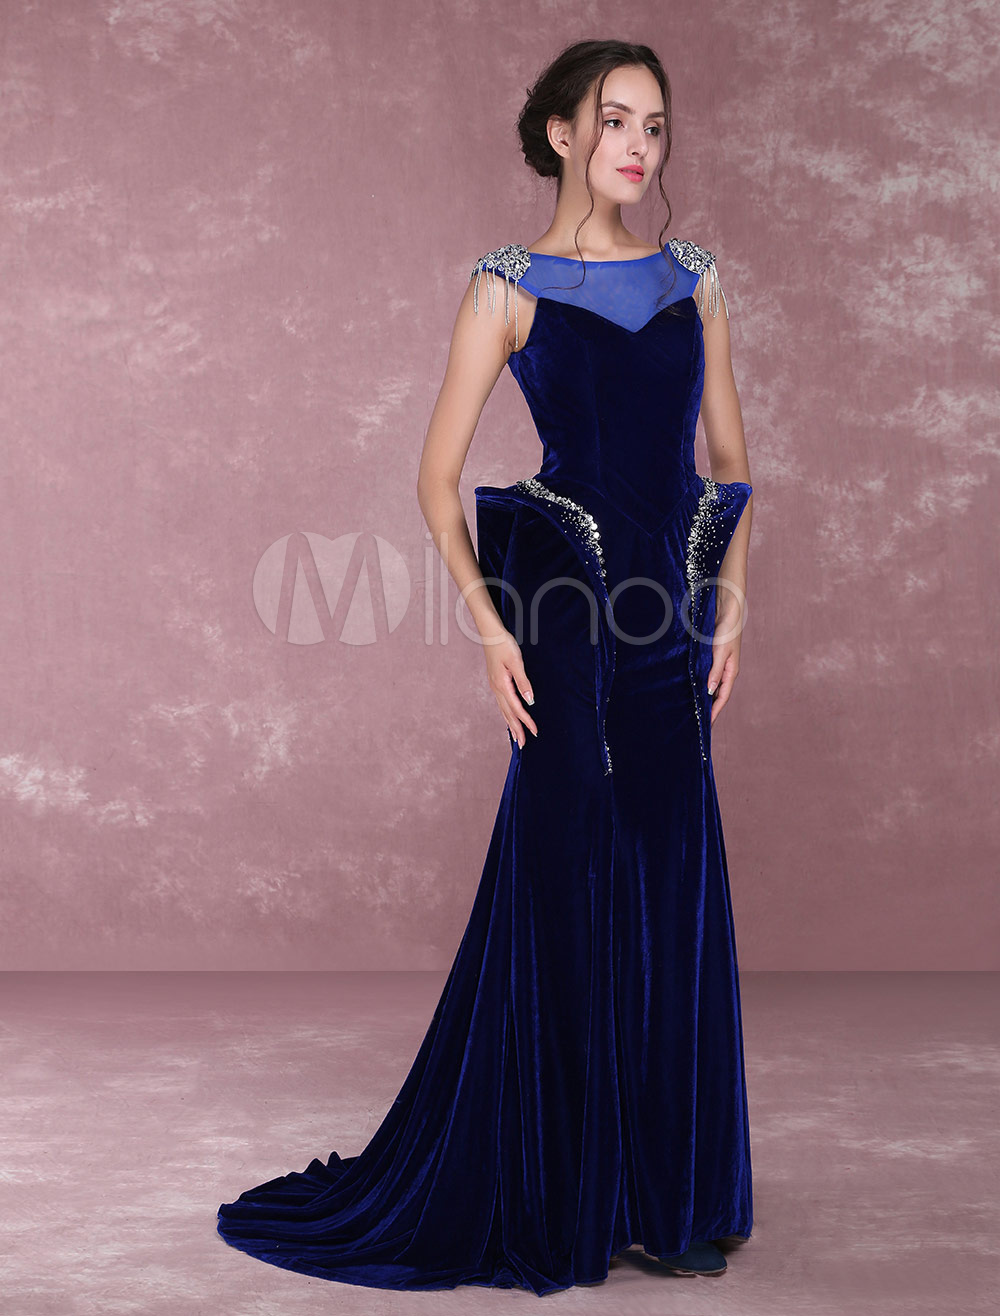 Velvet Evening Dresses Royal Blue Beading Illusion Mermaid Formal Party Dress